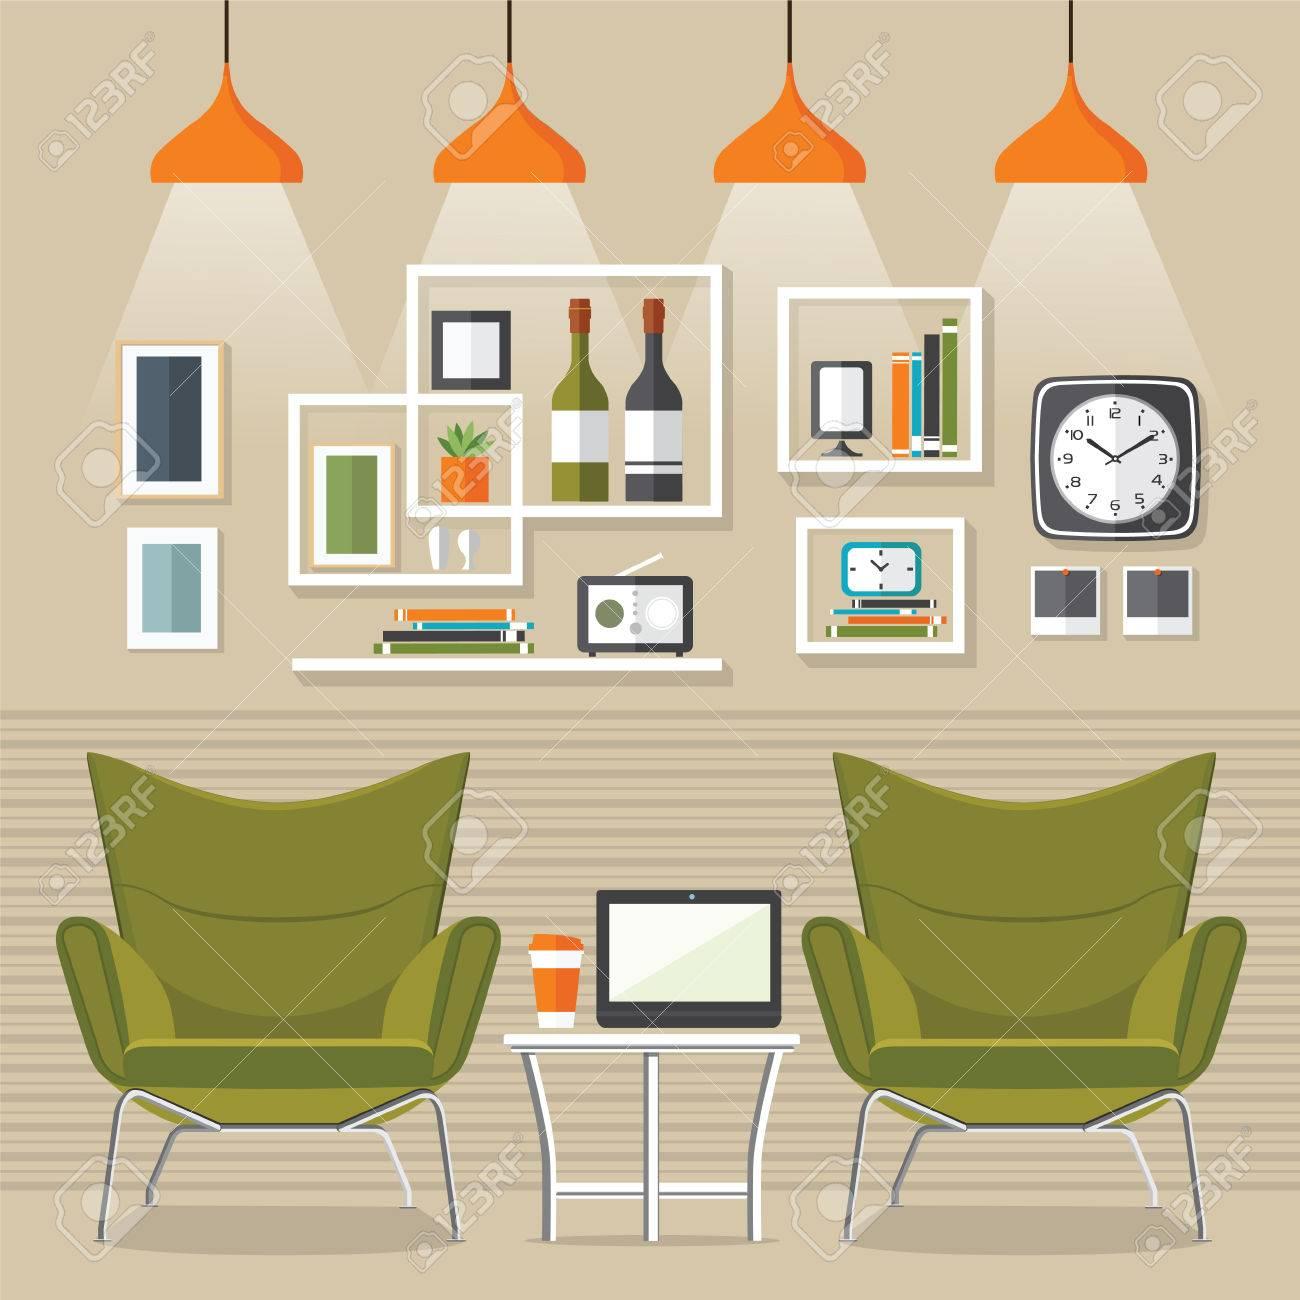 Interior Living Room With Sofa, Clock, Shelf With Books And A ...